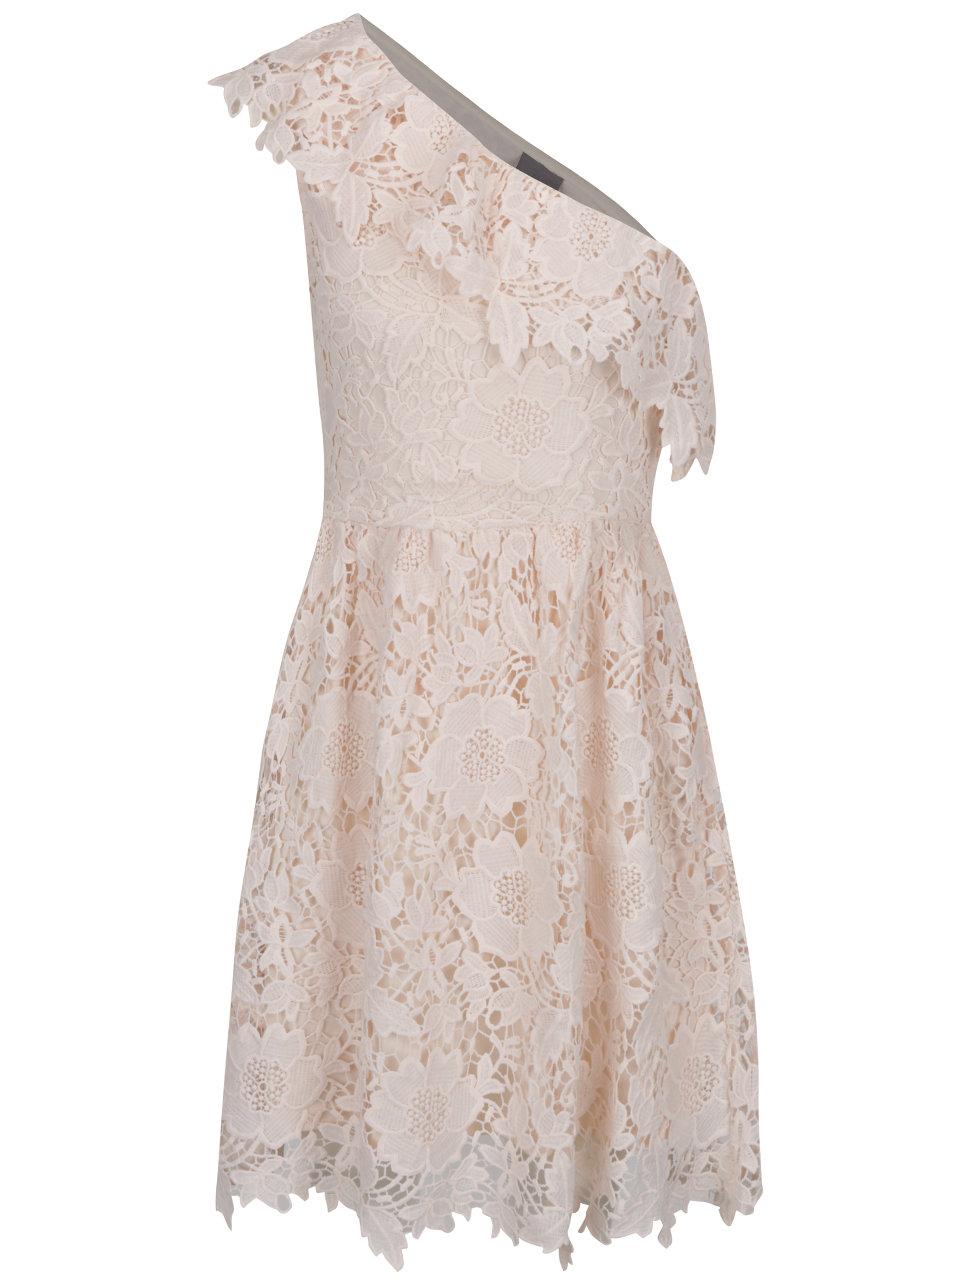 134de272ba0a Světle růžové krajkové šaty přes jedno rameno VERO MODA Thus ...